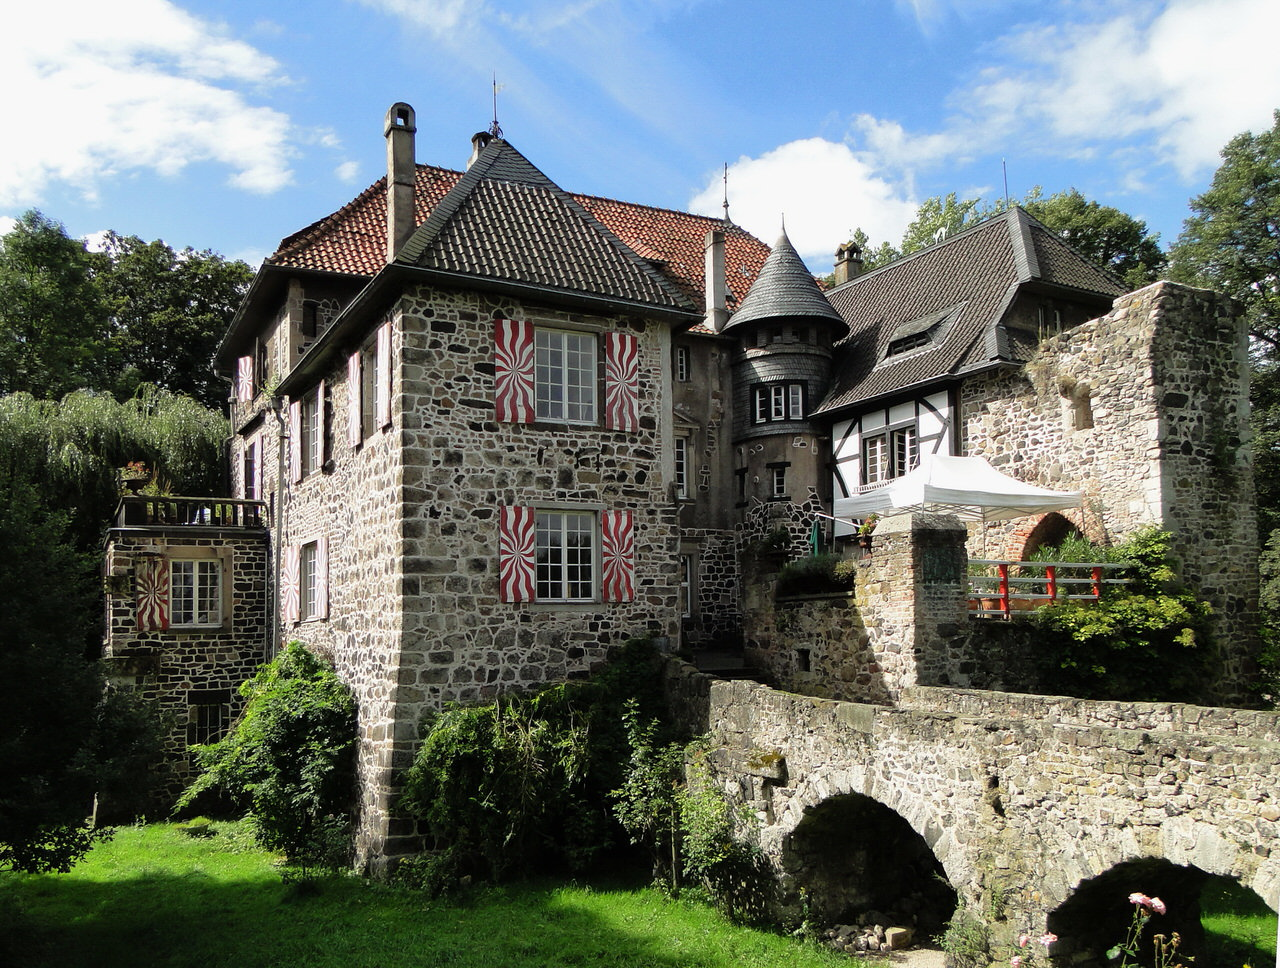 Blick auf Burg Lede in Bonn Villich